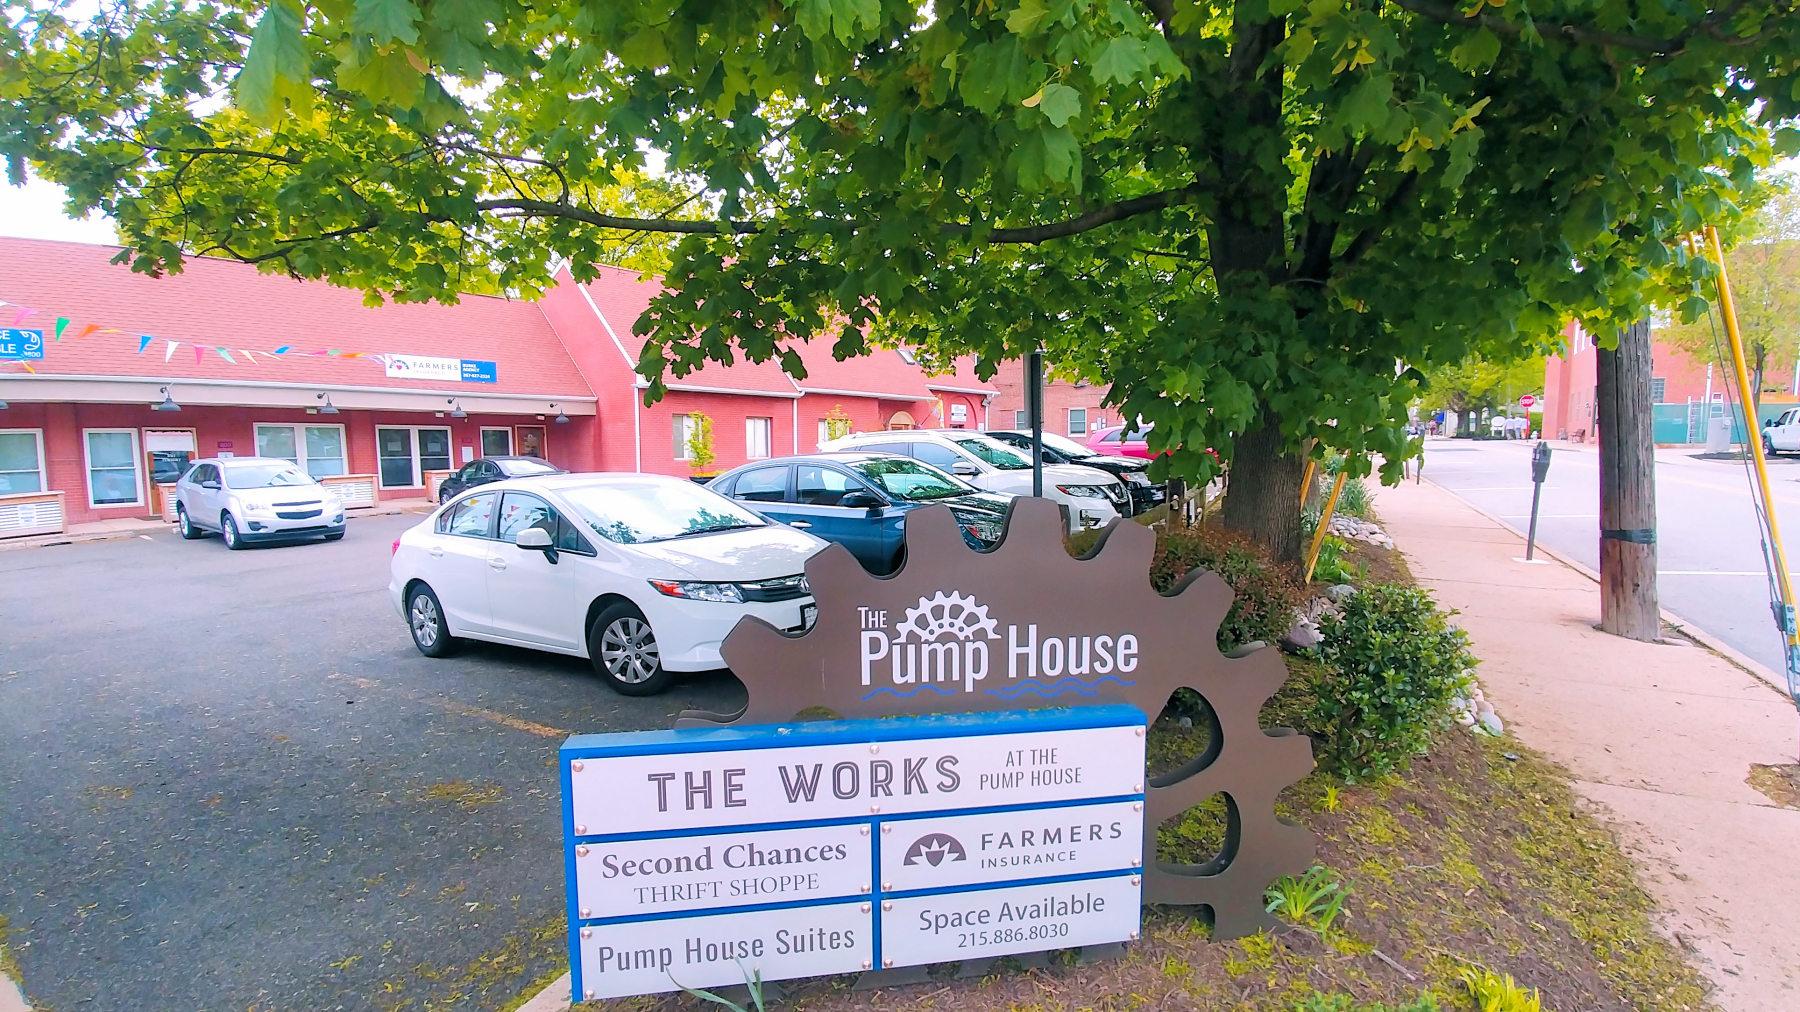 201 Leedom Parking Pump House